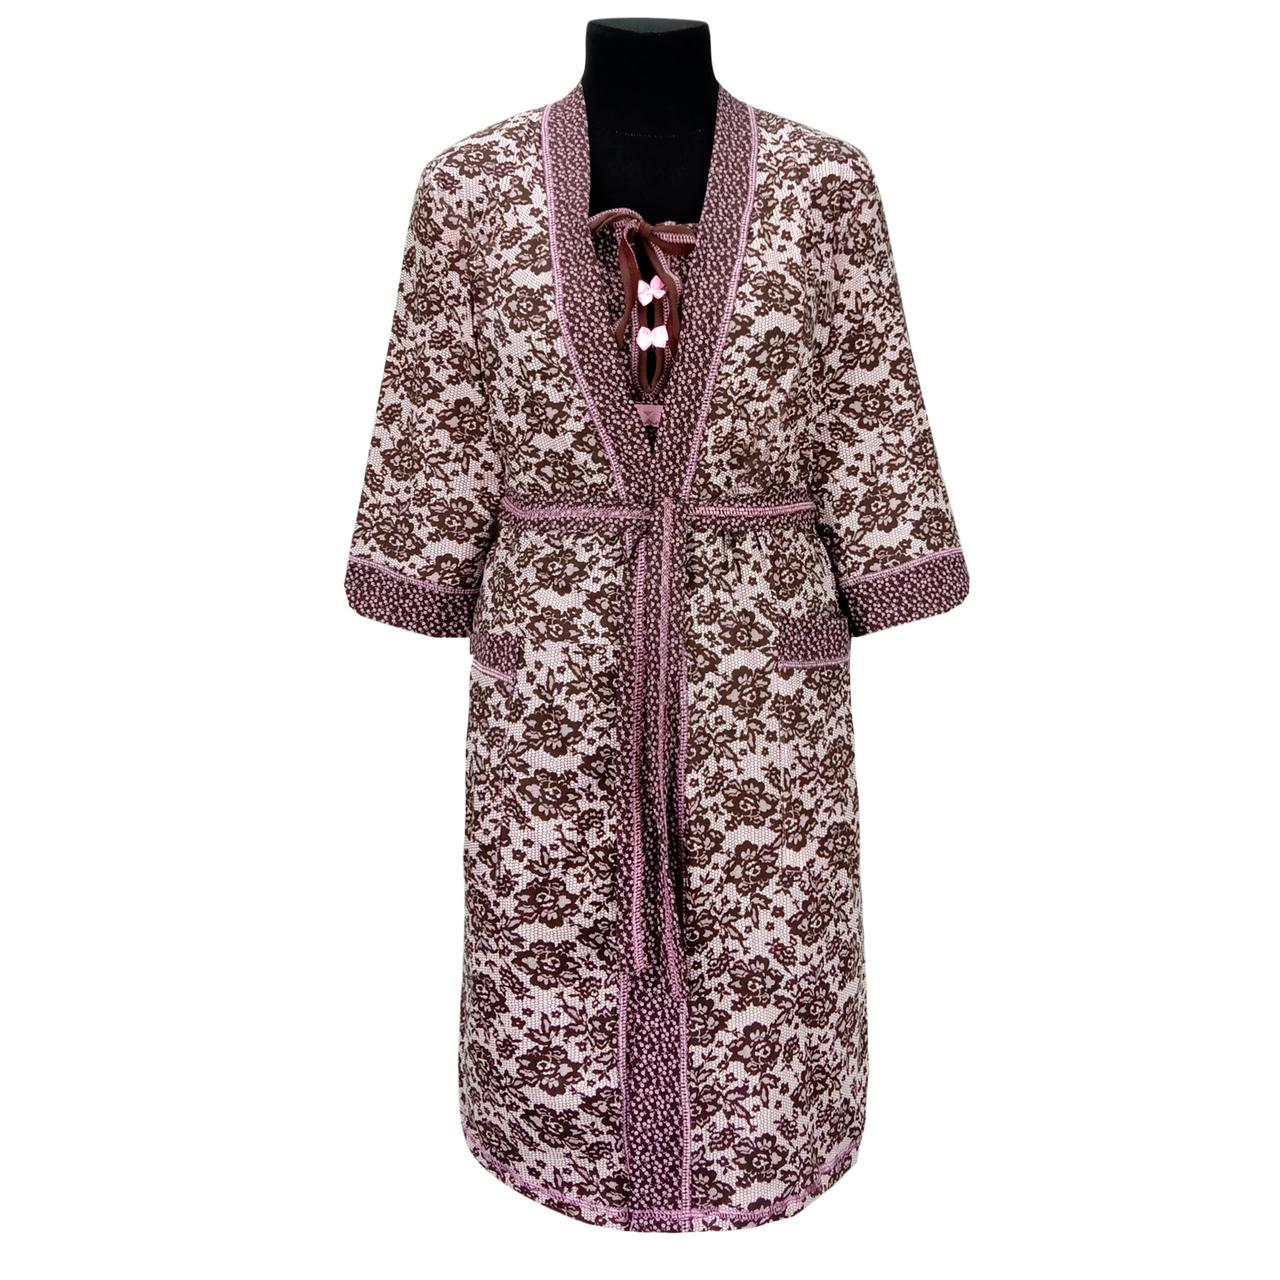 Комплект женский Ажур ночная рубашка и халат